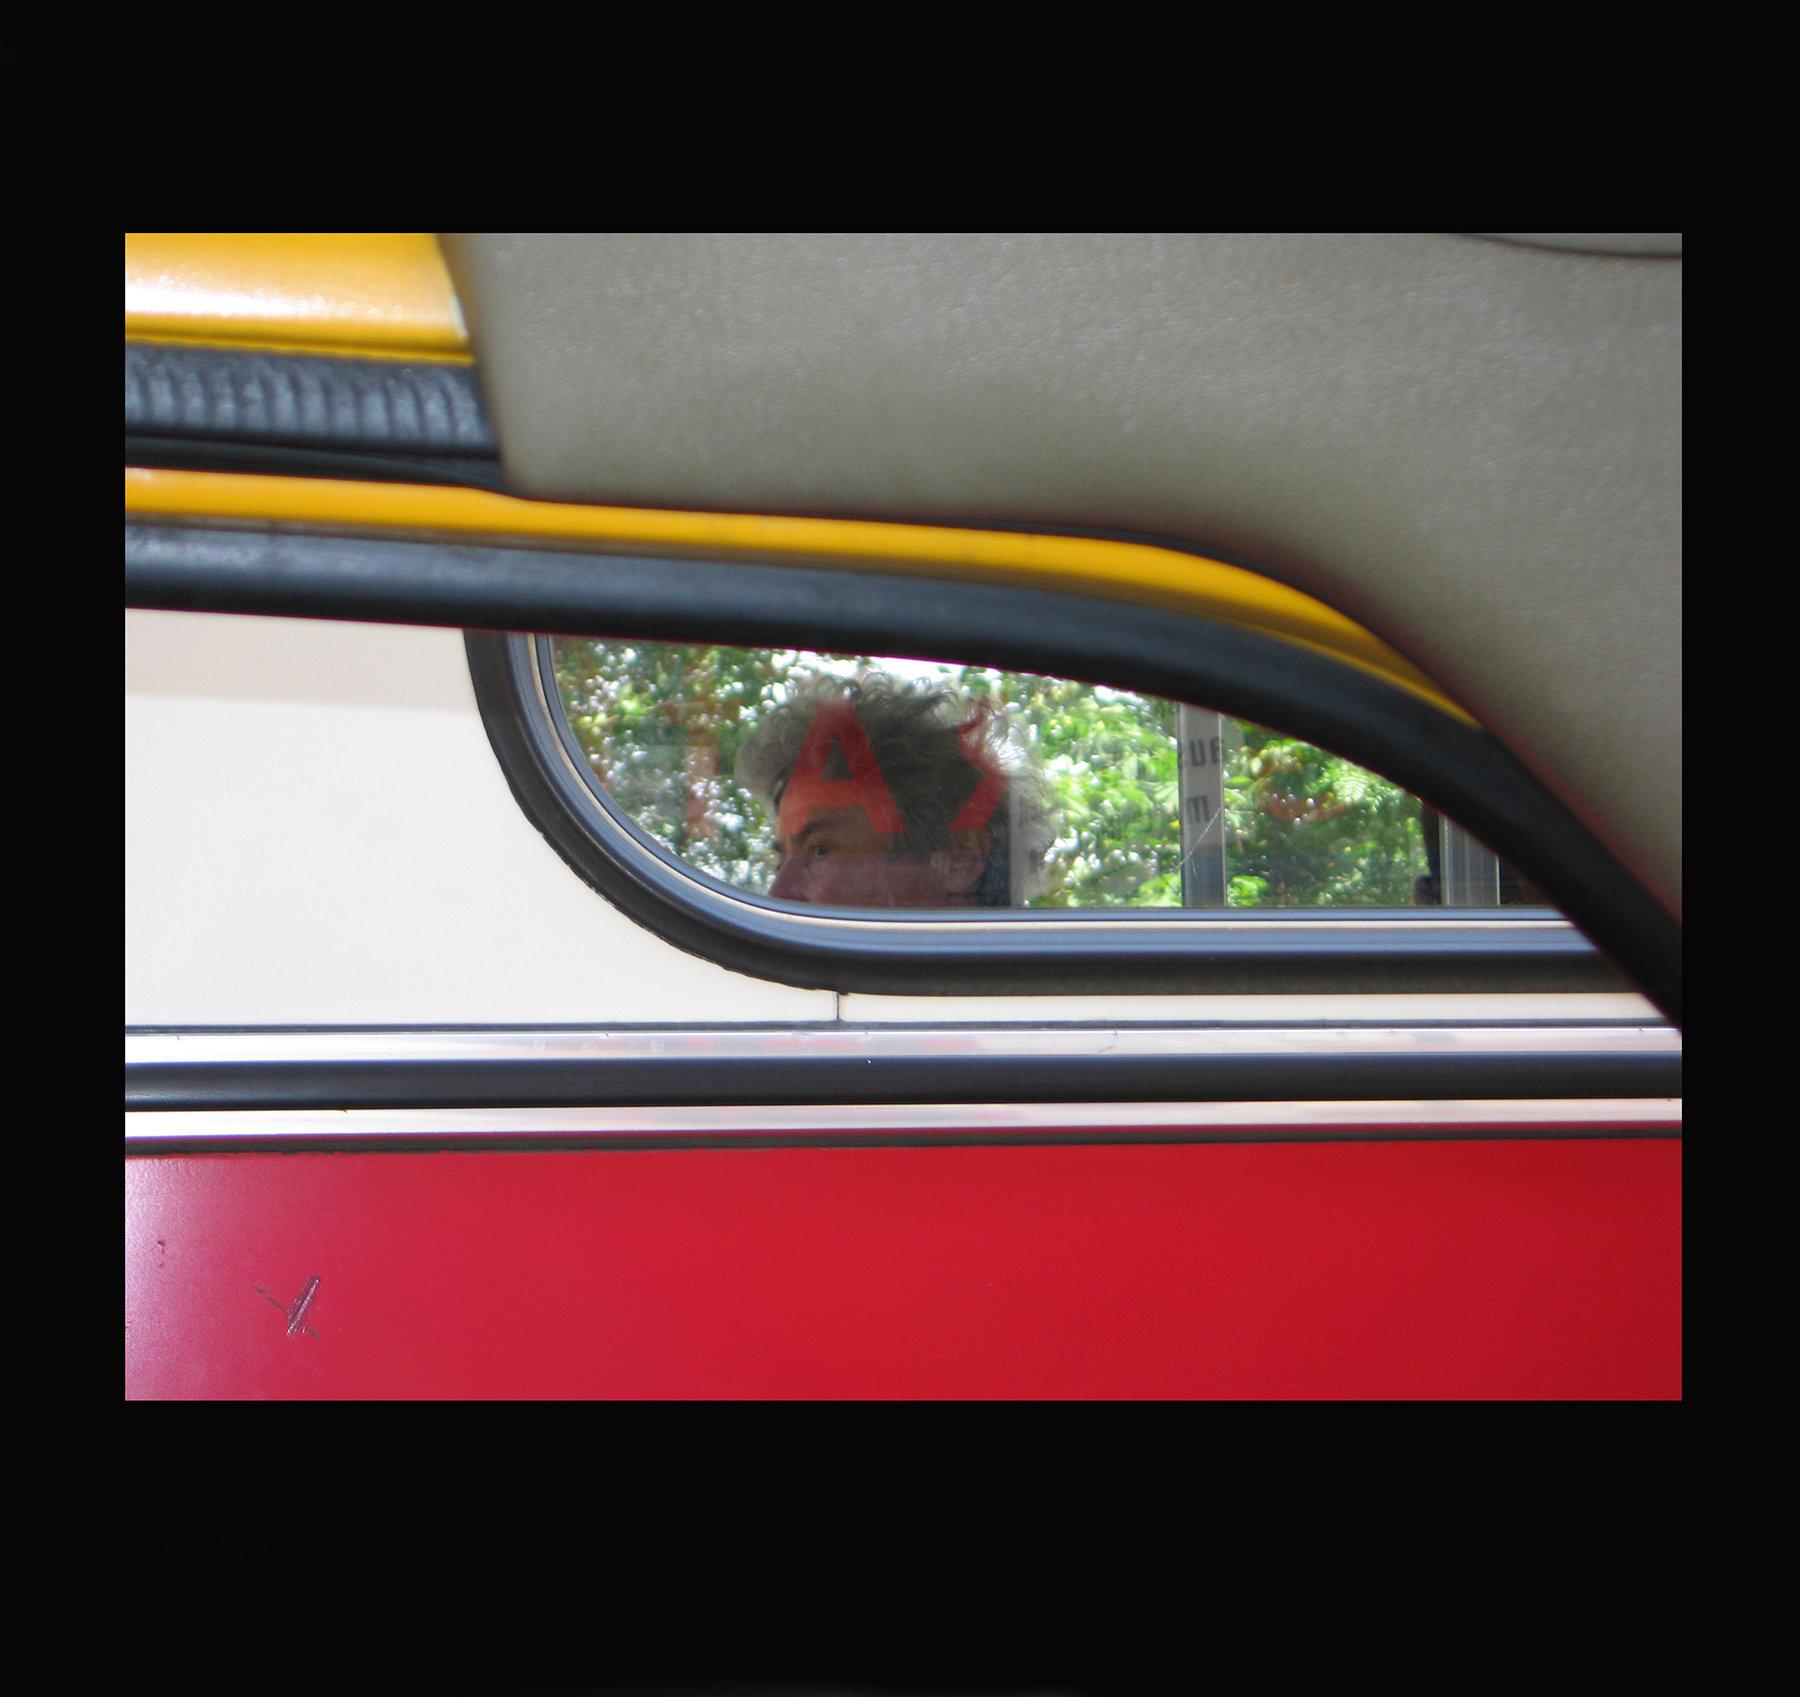 0010_Ian-Paradine-Ern-Malley-Sighting-A2-4--200-dpi-web.jpg